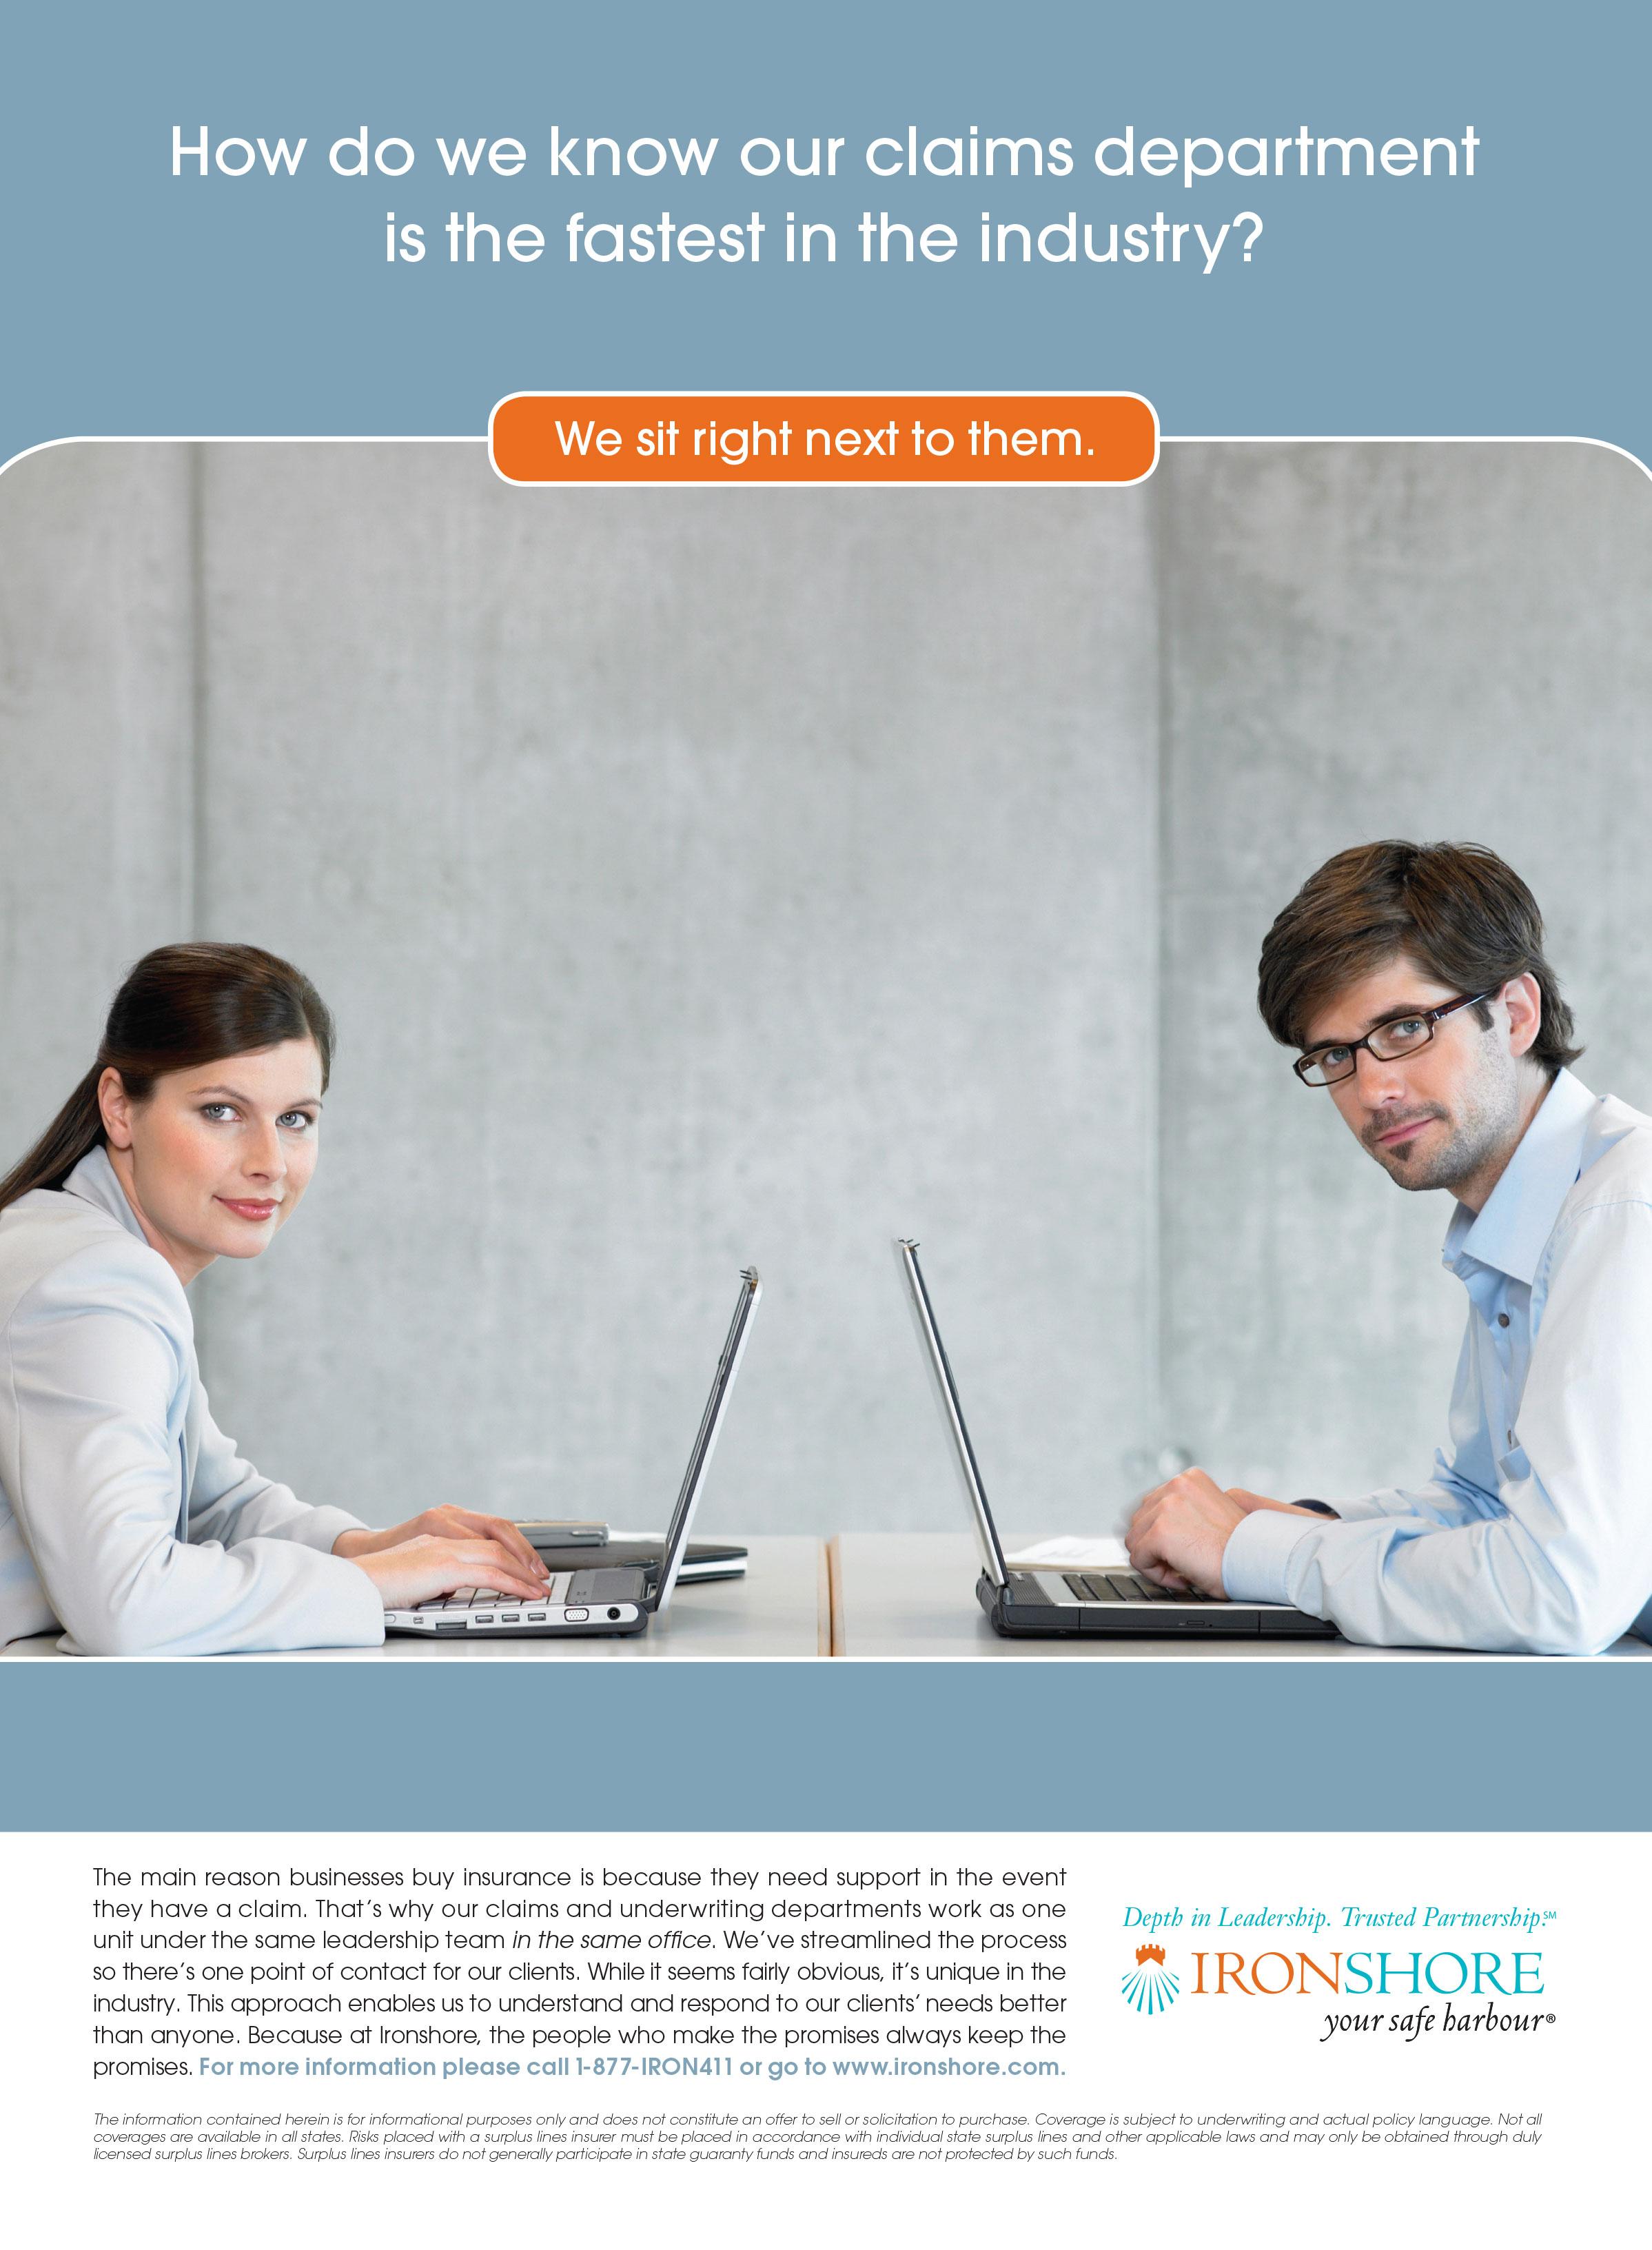 ironshore-insurance-advertising-claims-department.jpg